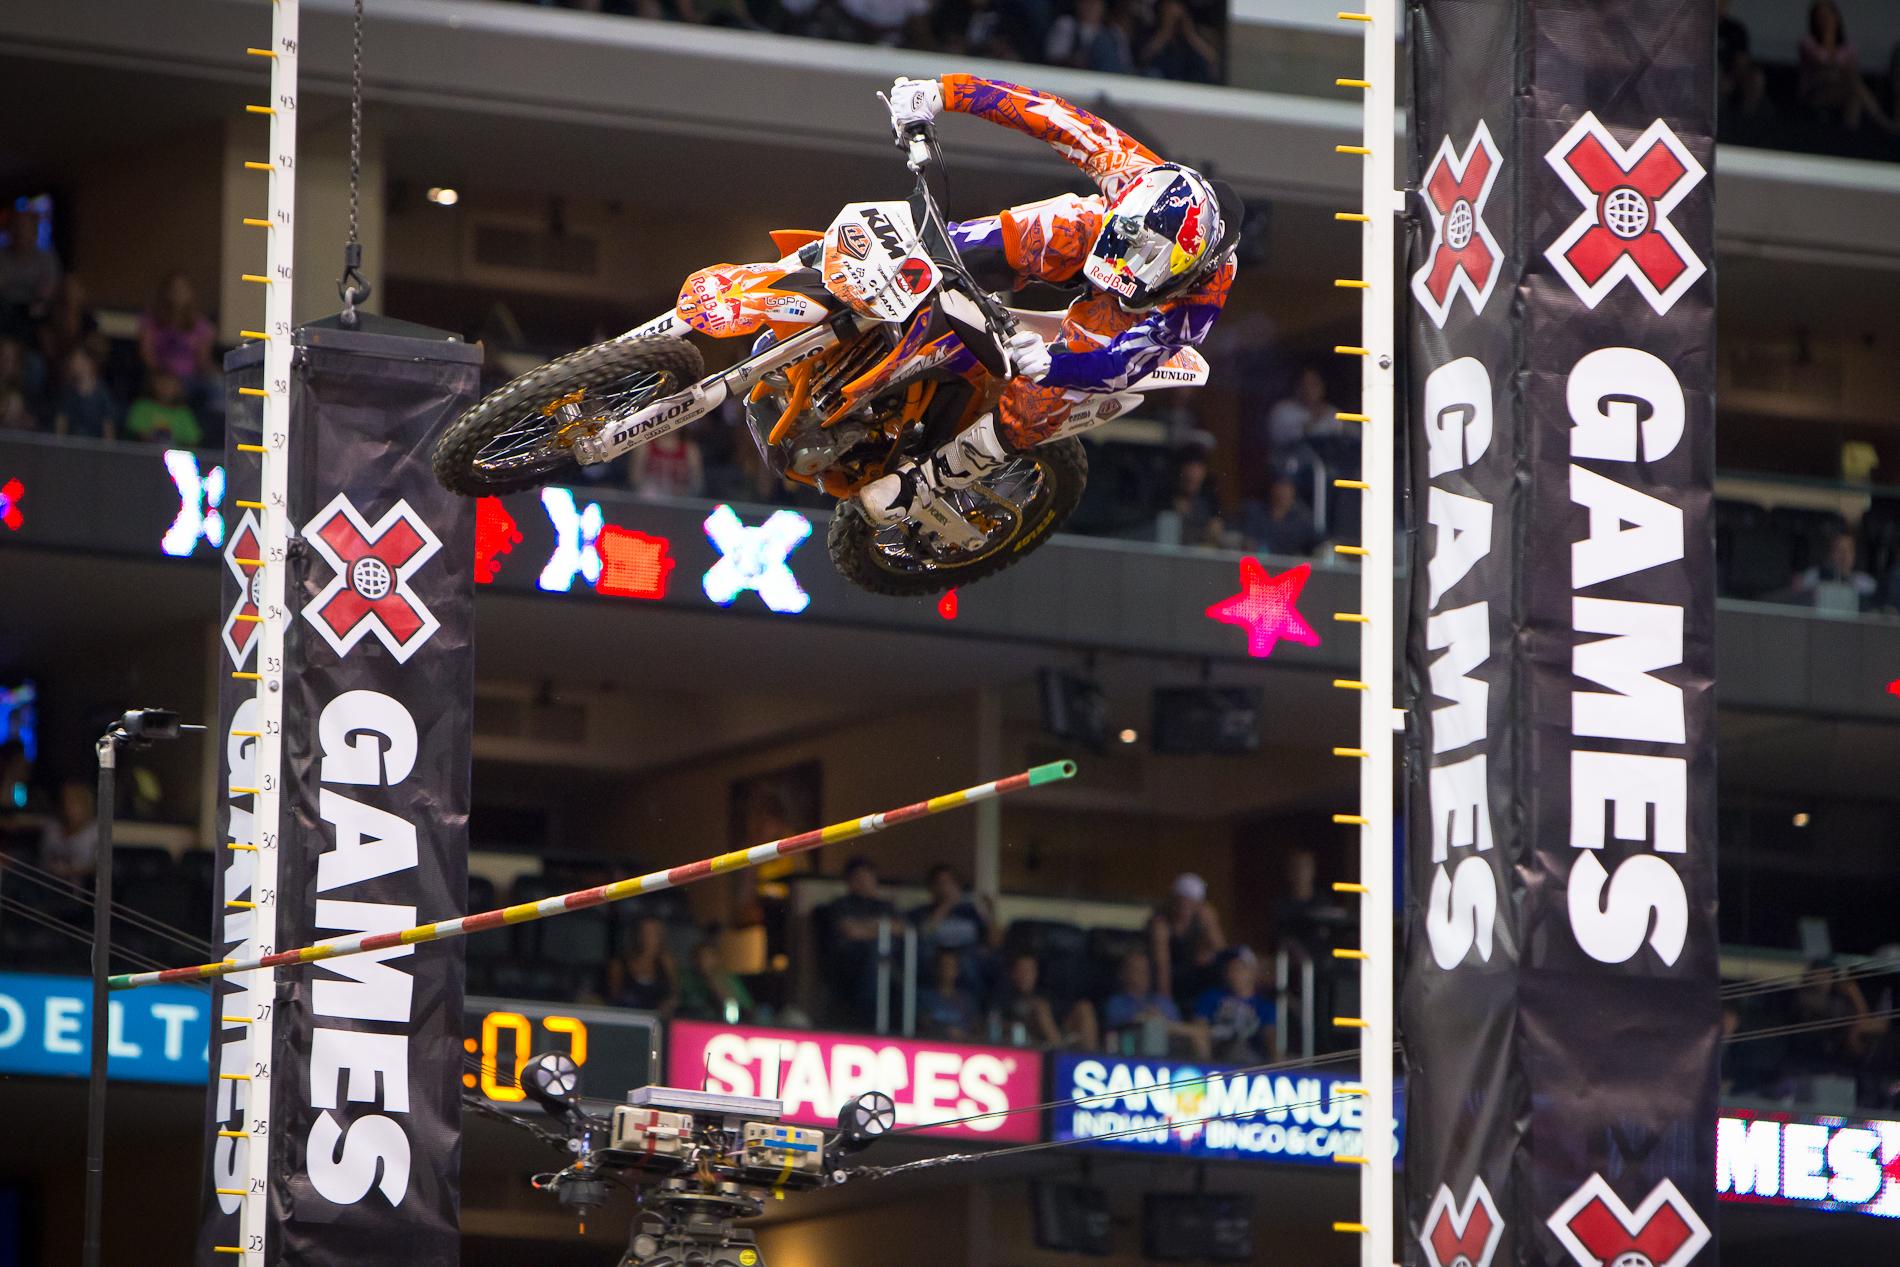 Motocross Stunt bei den xGames, dem größten der Extremsport Events